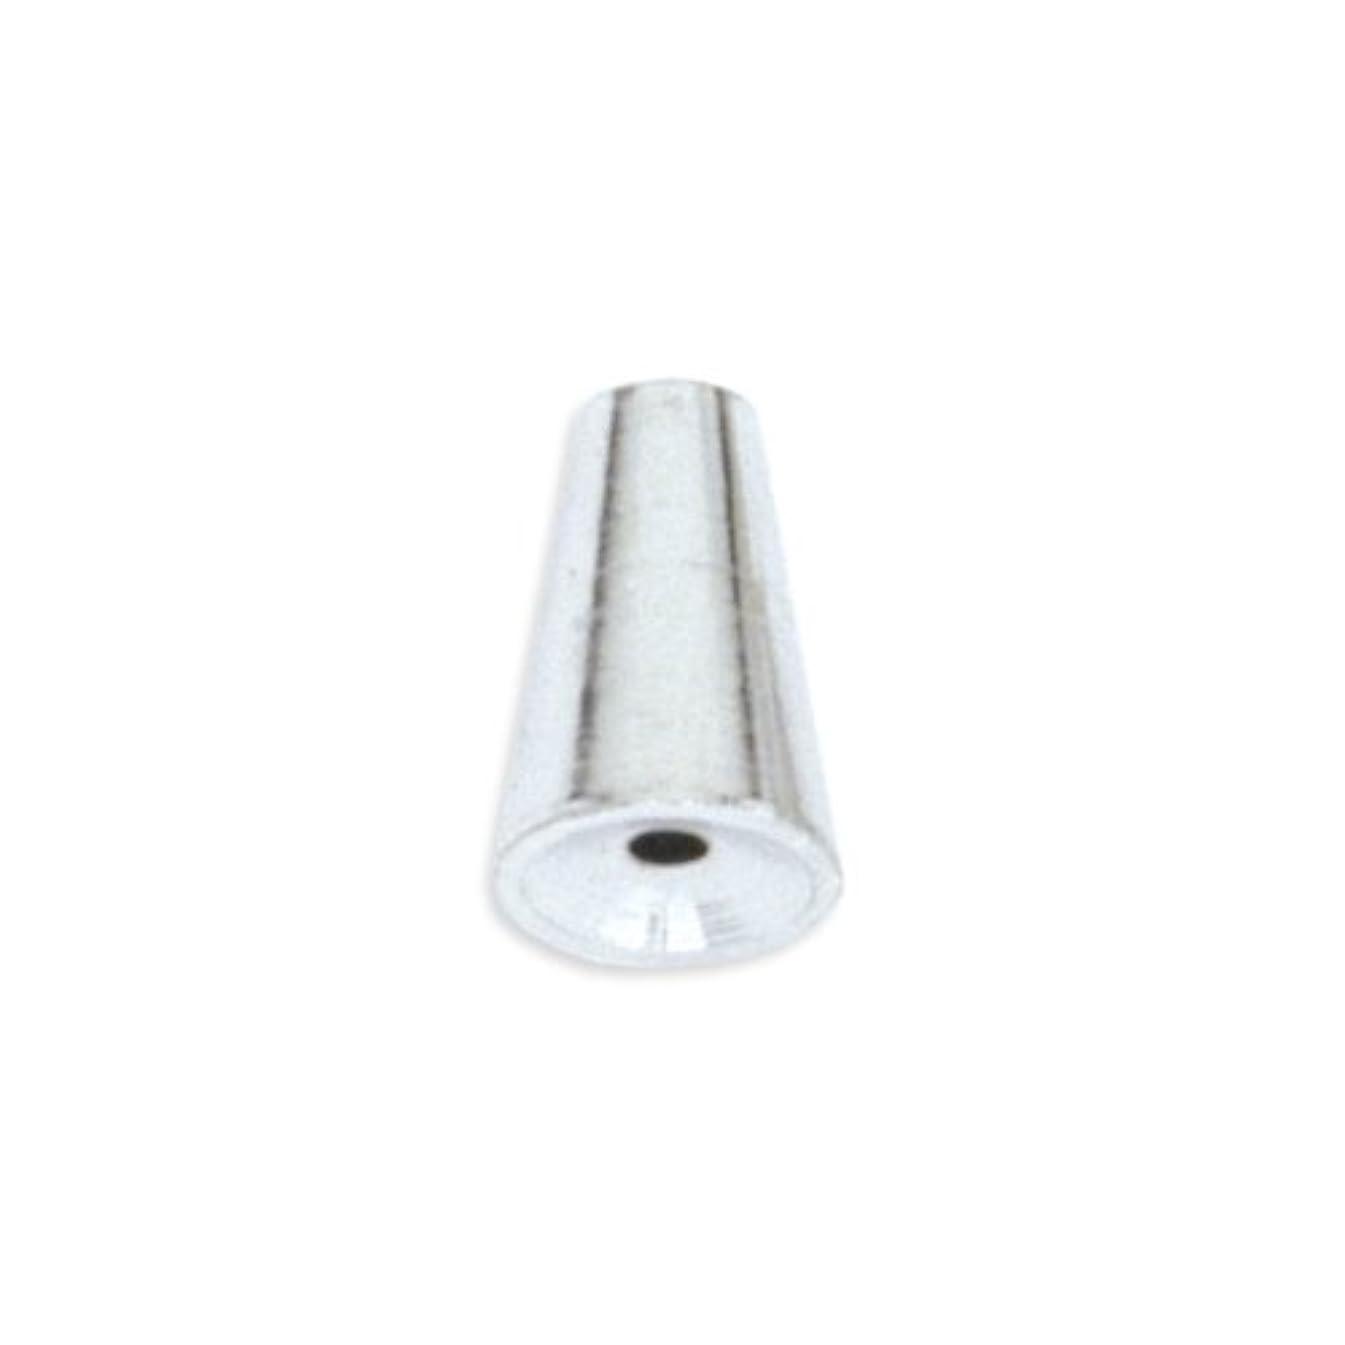 Beadalon 72-Piece 6-1/2-MM Cone Memory Wire End Cap, White Plate